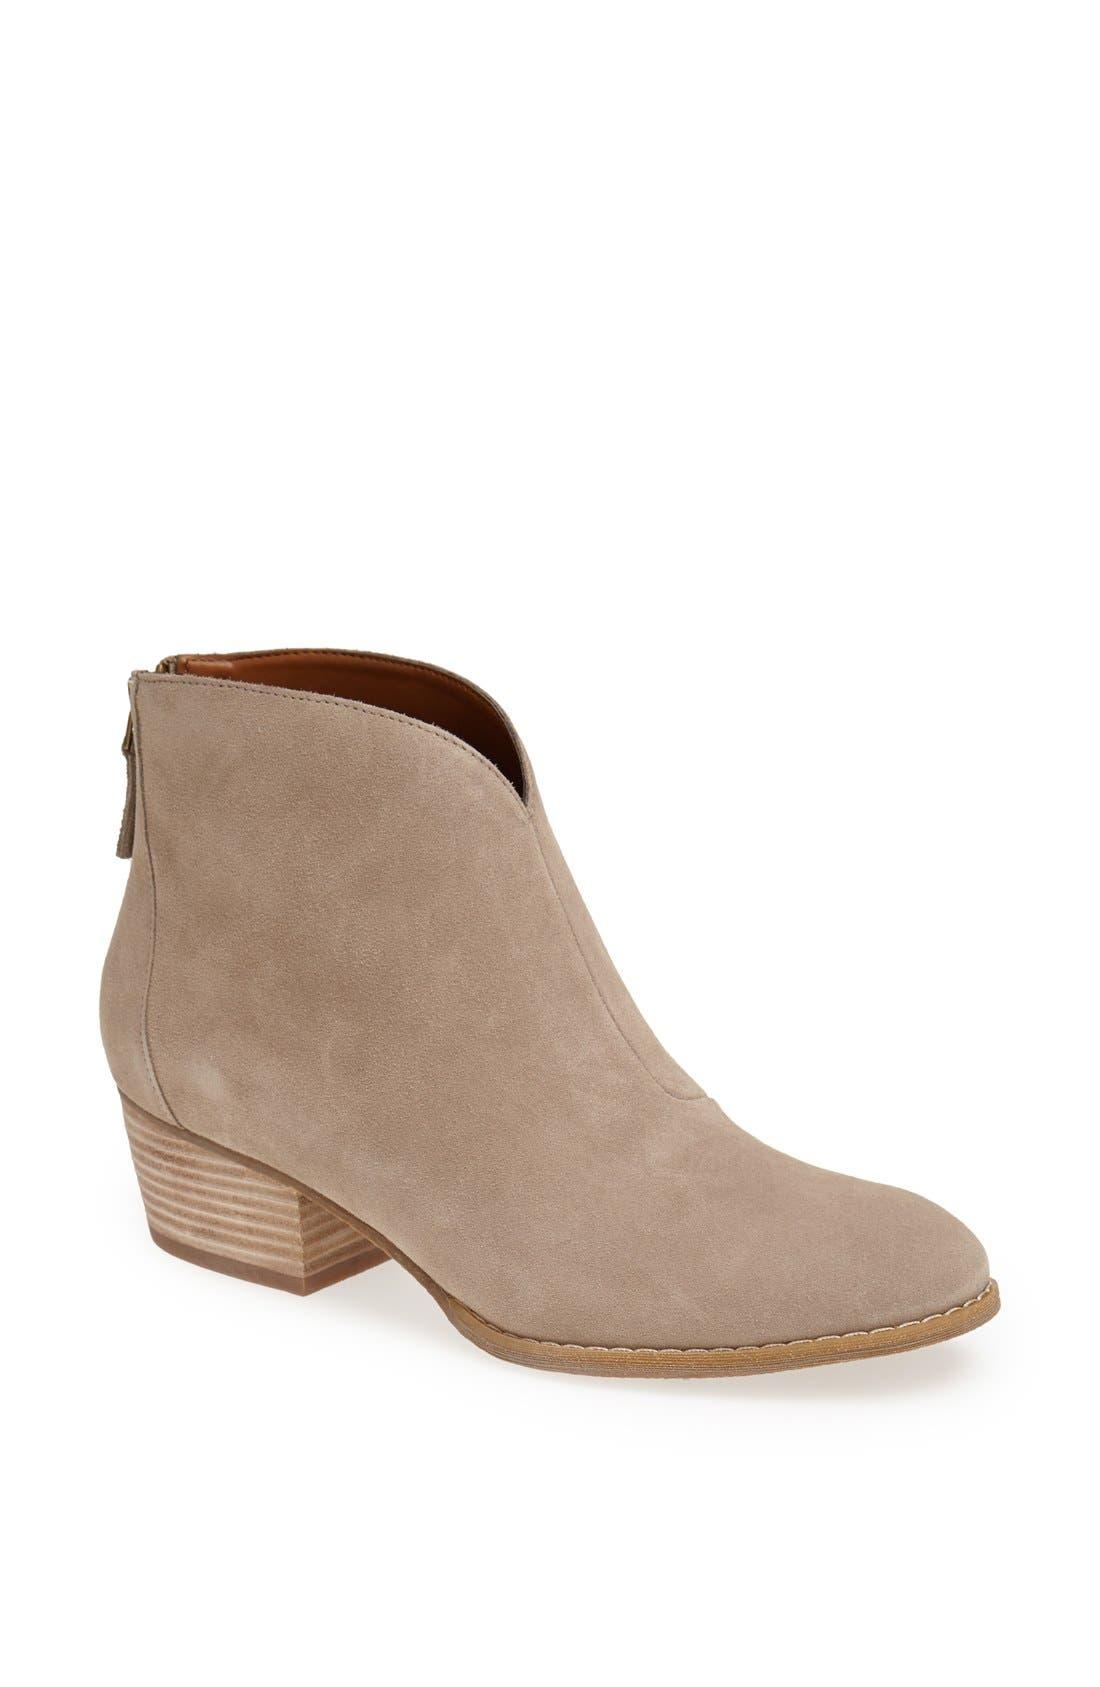 Alternate Image 1 Selected - Nine West 'Jarrad' Leather Boot